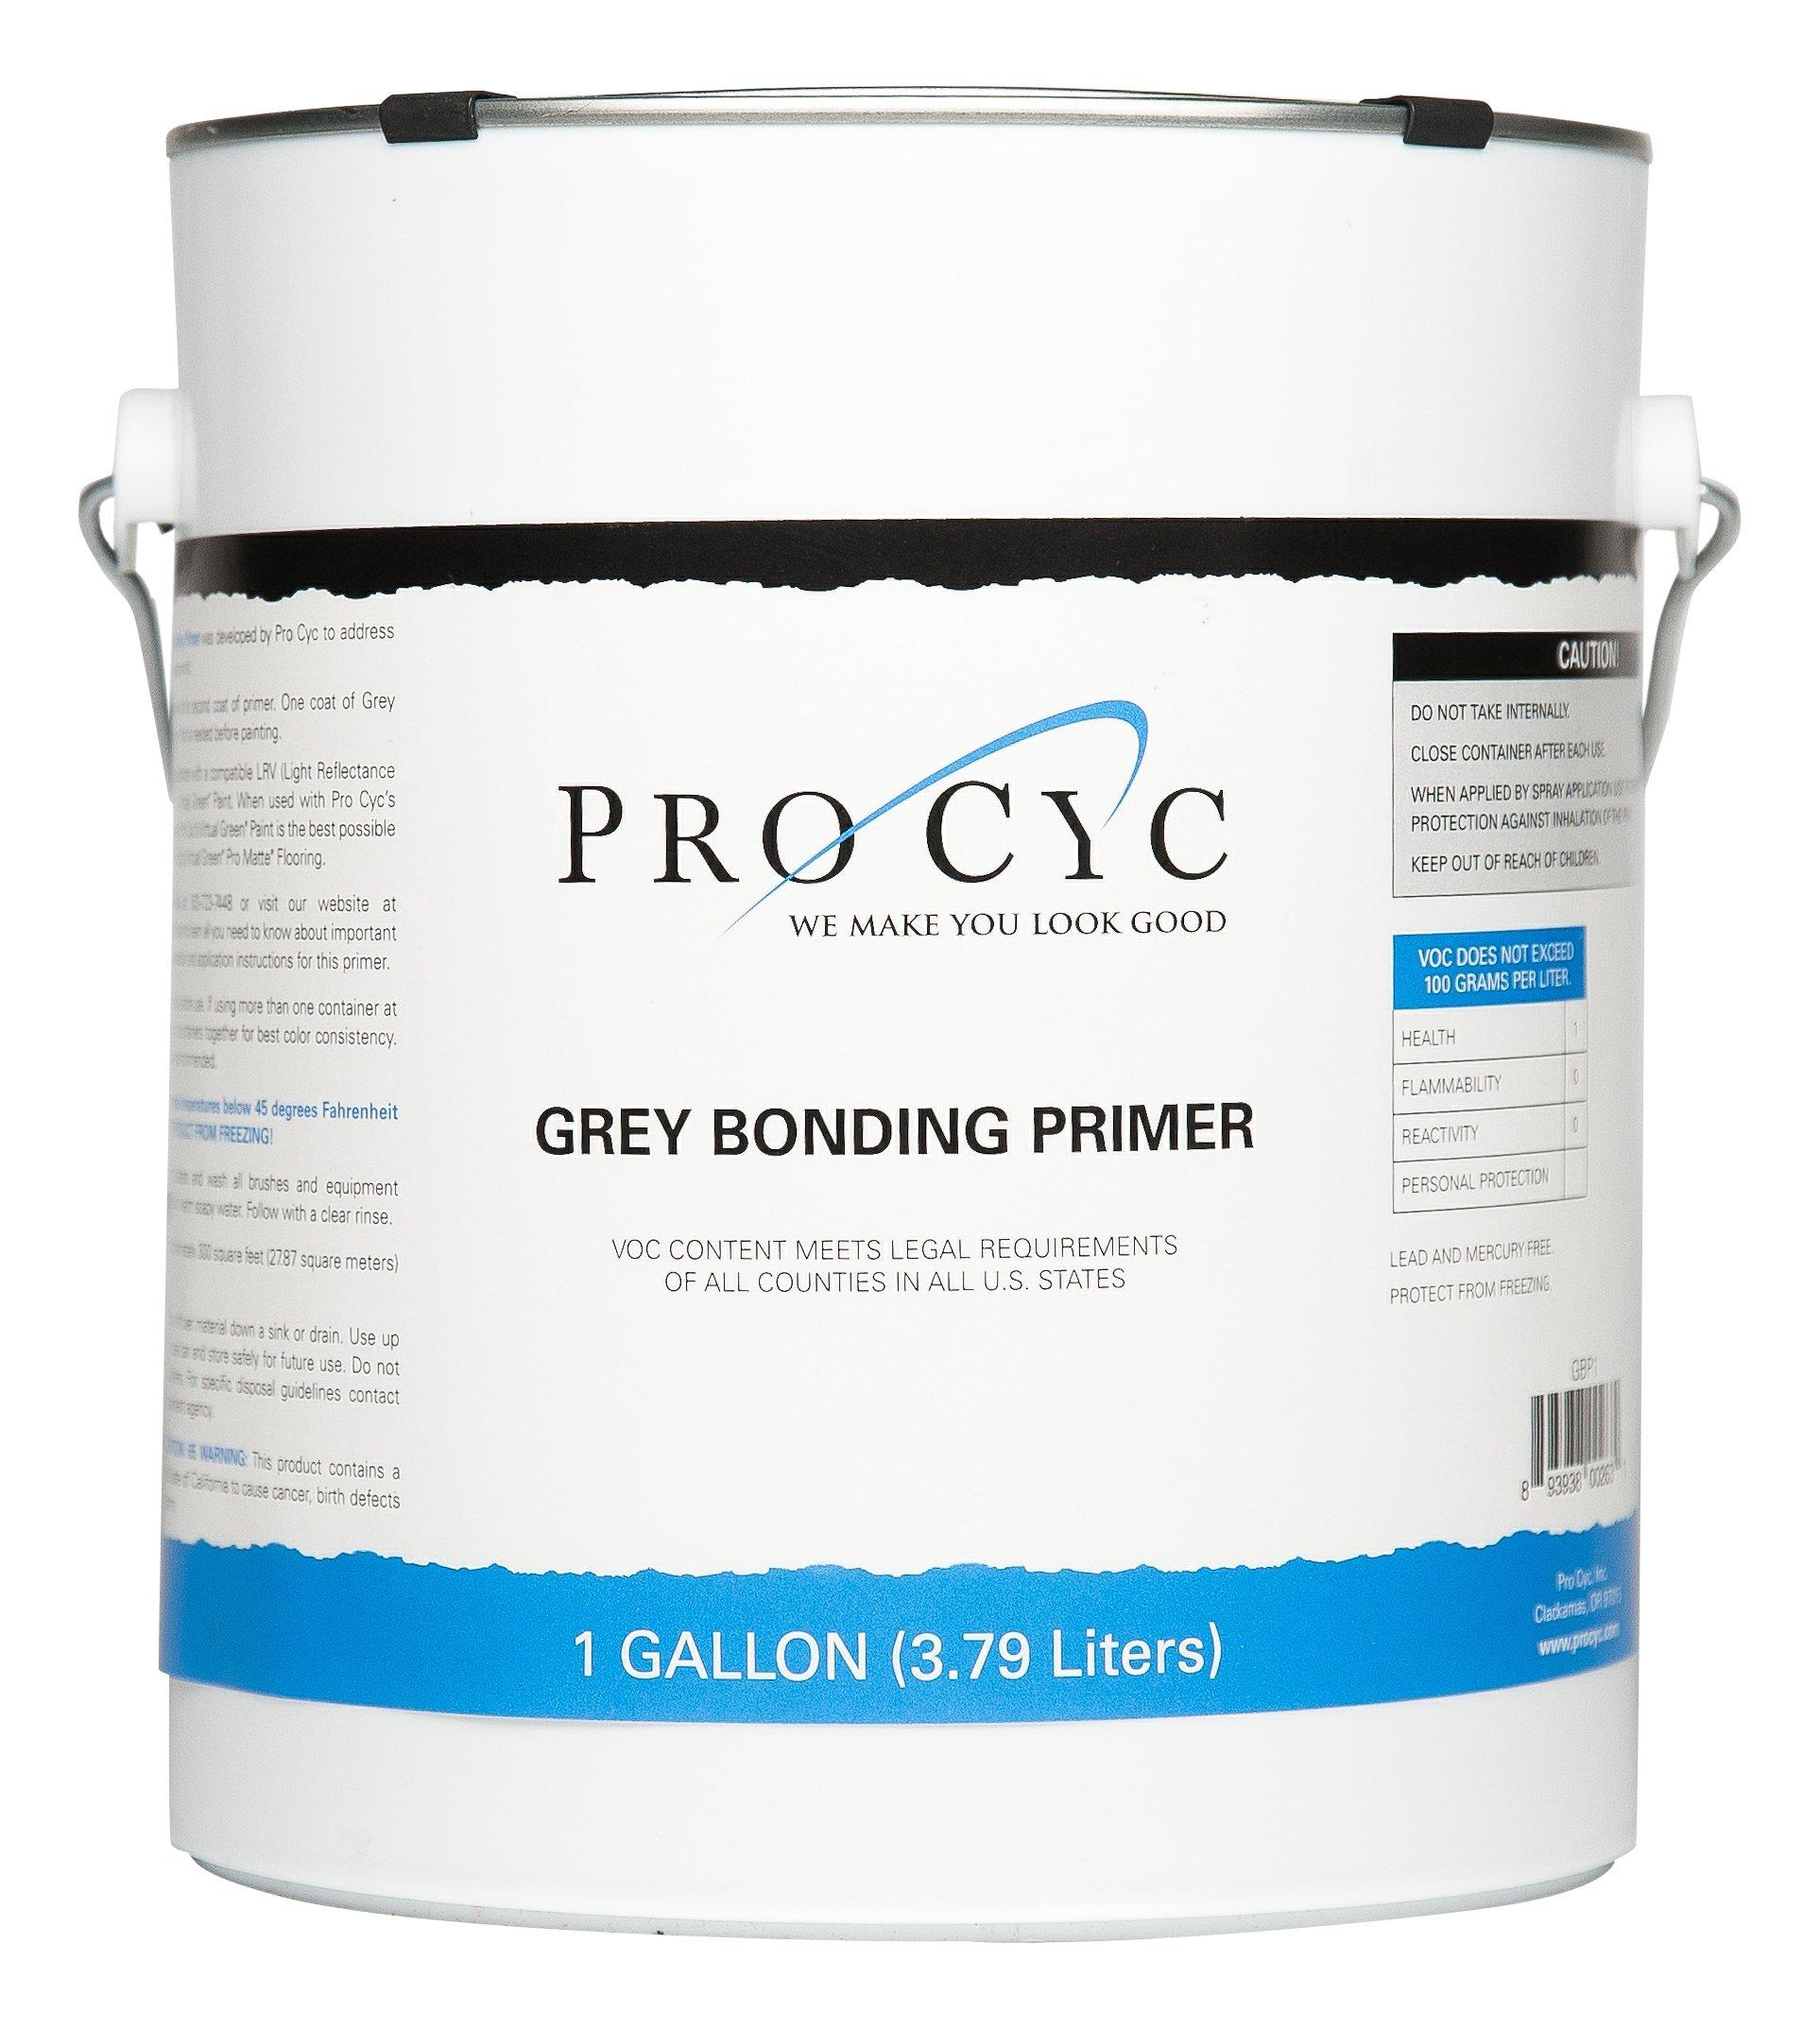 ProCyc GBP1 Bonding Primer for Use with Pro Cyc Virtual Green Chroma Key Paint